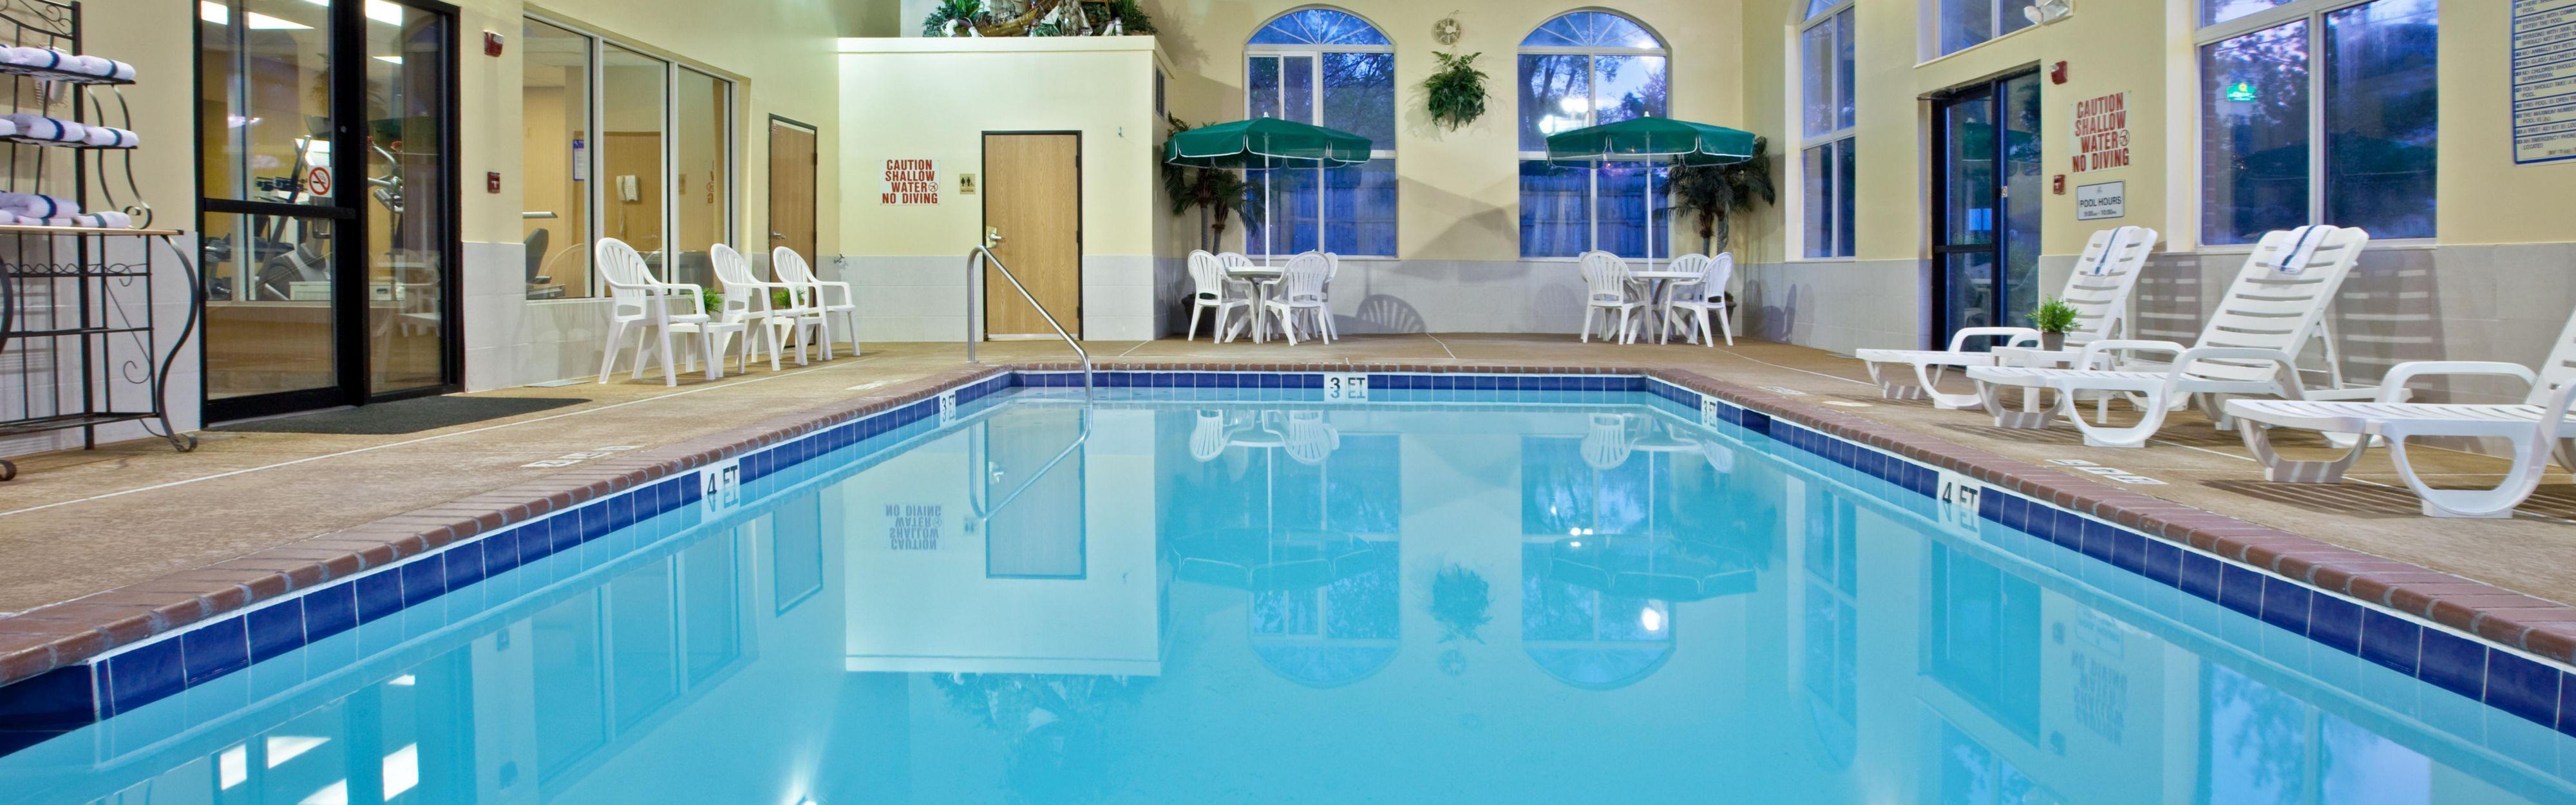 Holiday Inn Express Cincinnati-N/Sharonville image 2